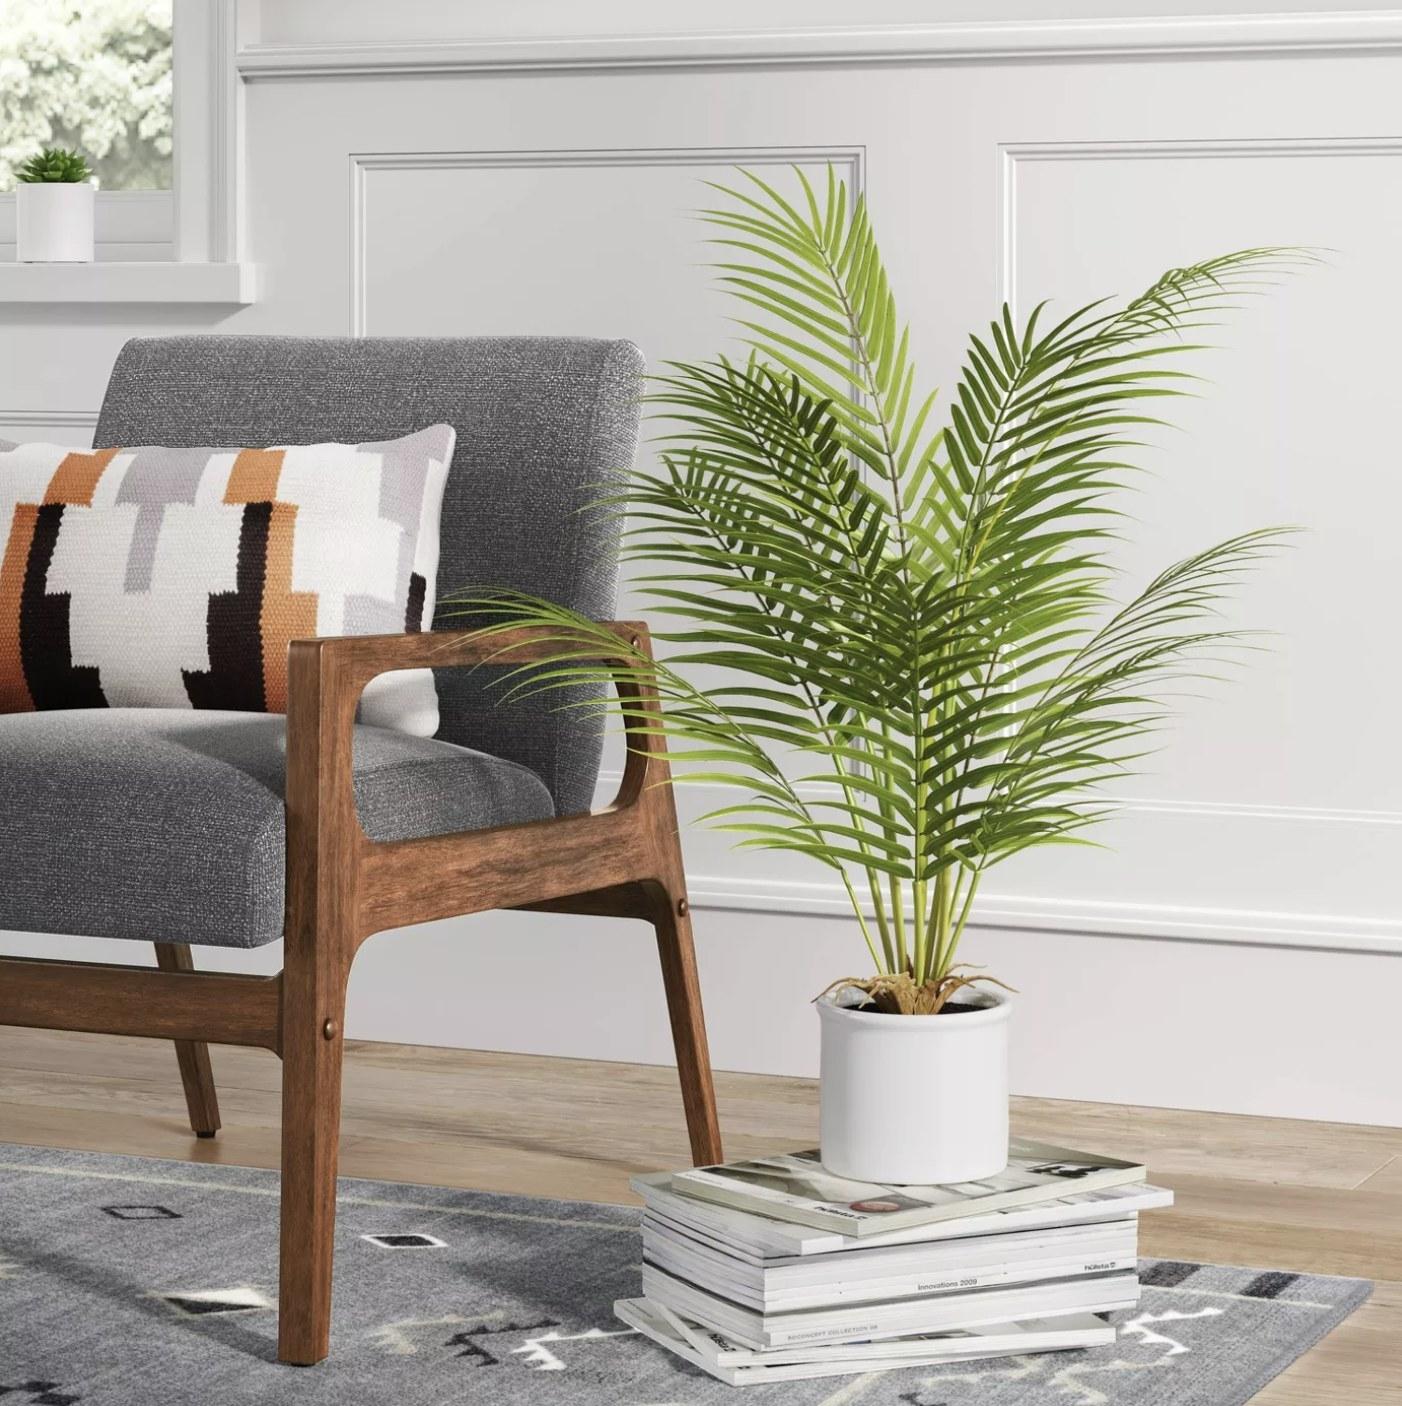 The artificial palm plant